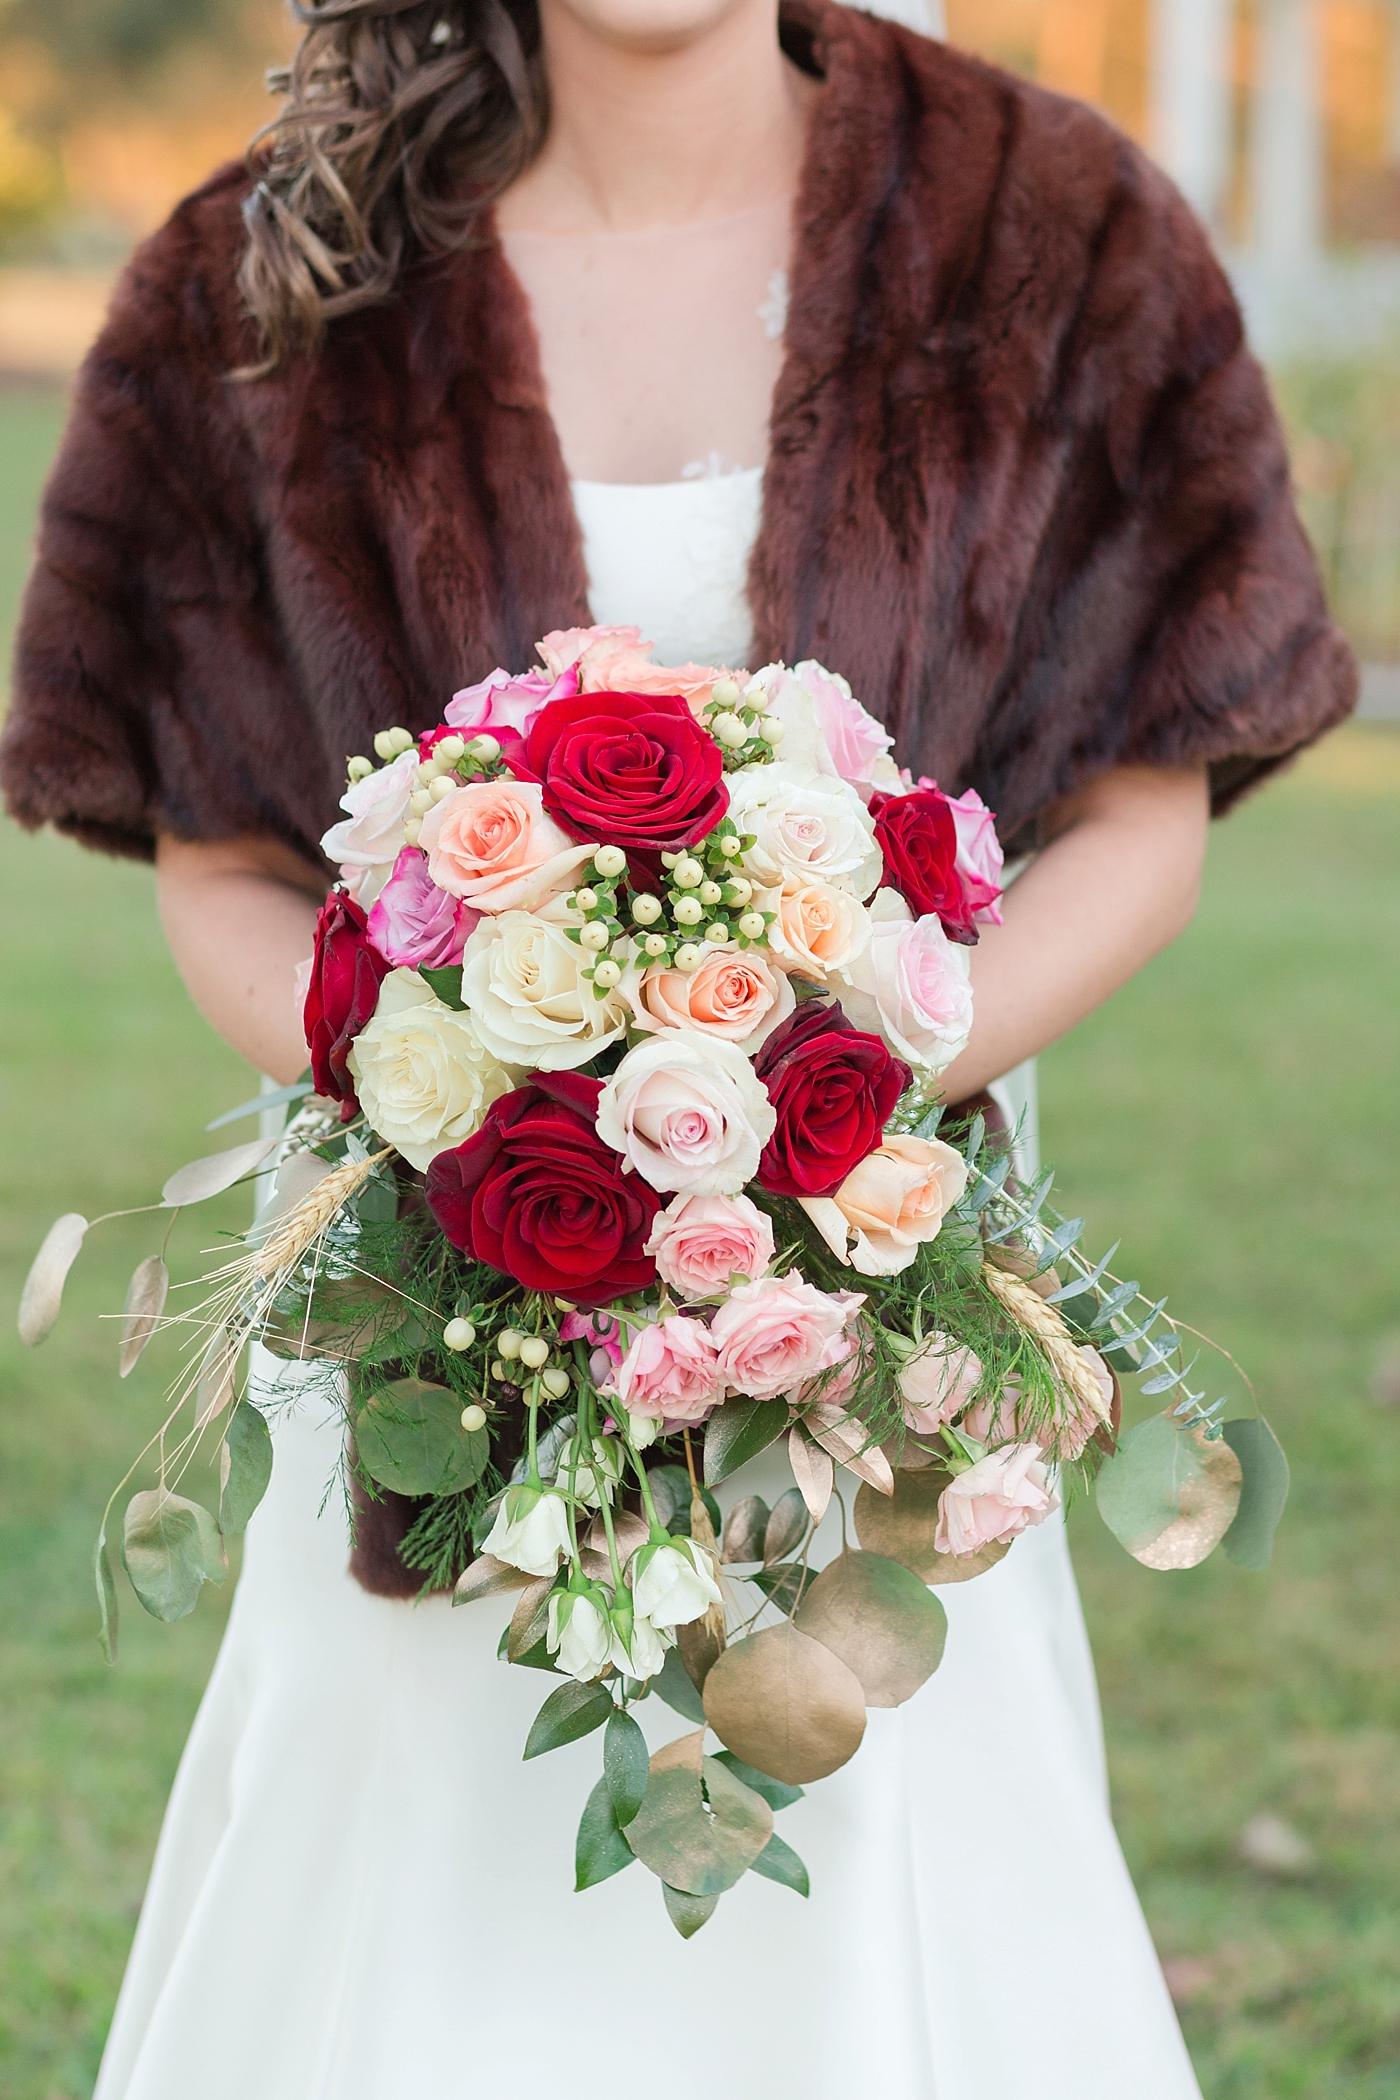 greenville-nc-wedding-the-robins-nest_56.jpg